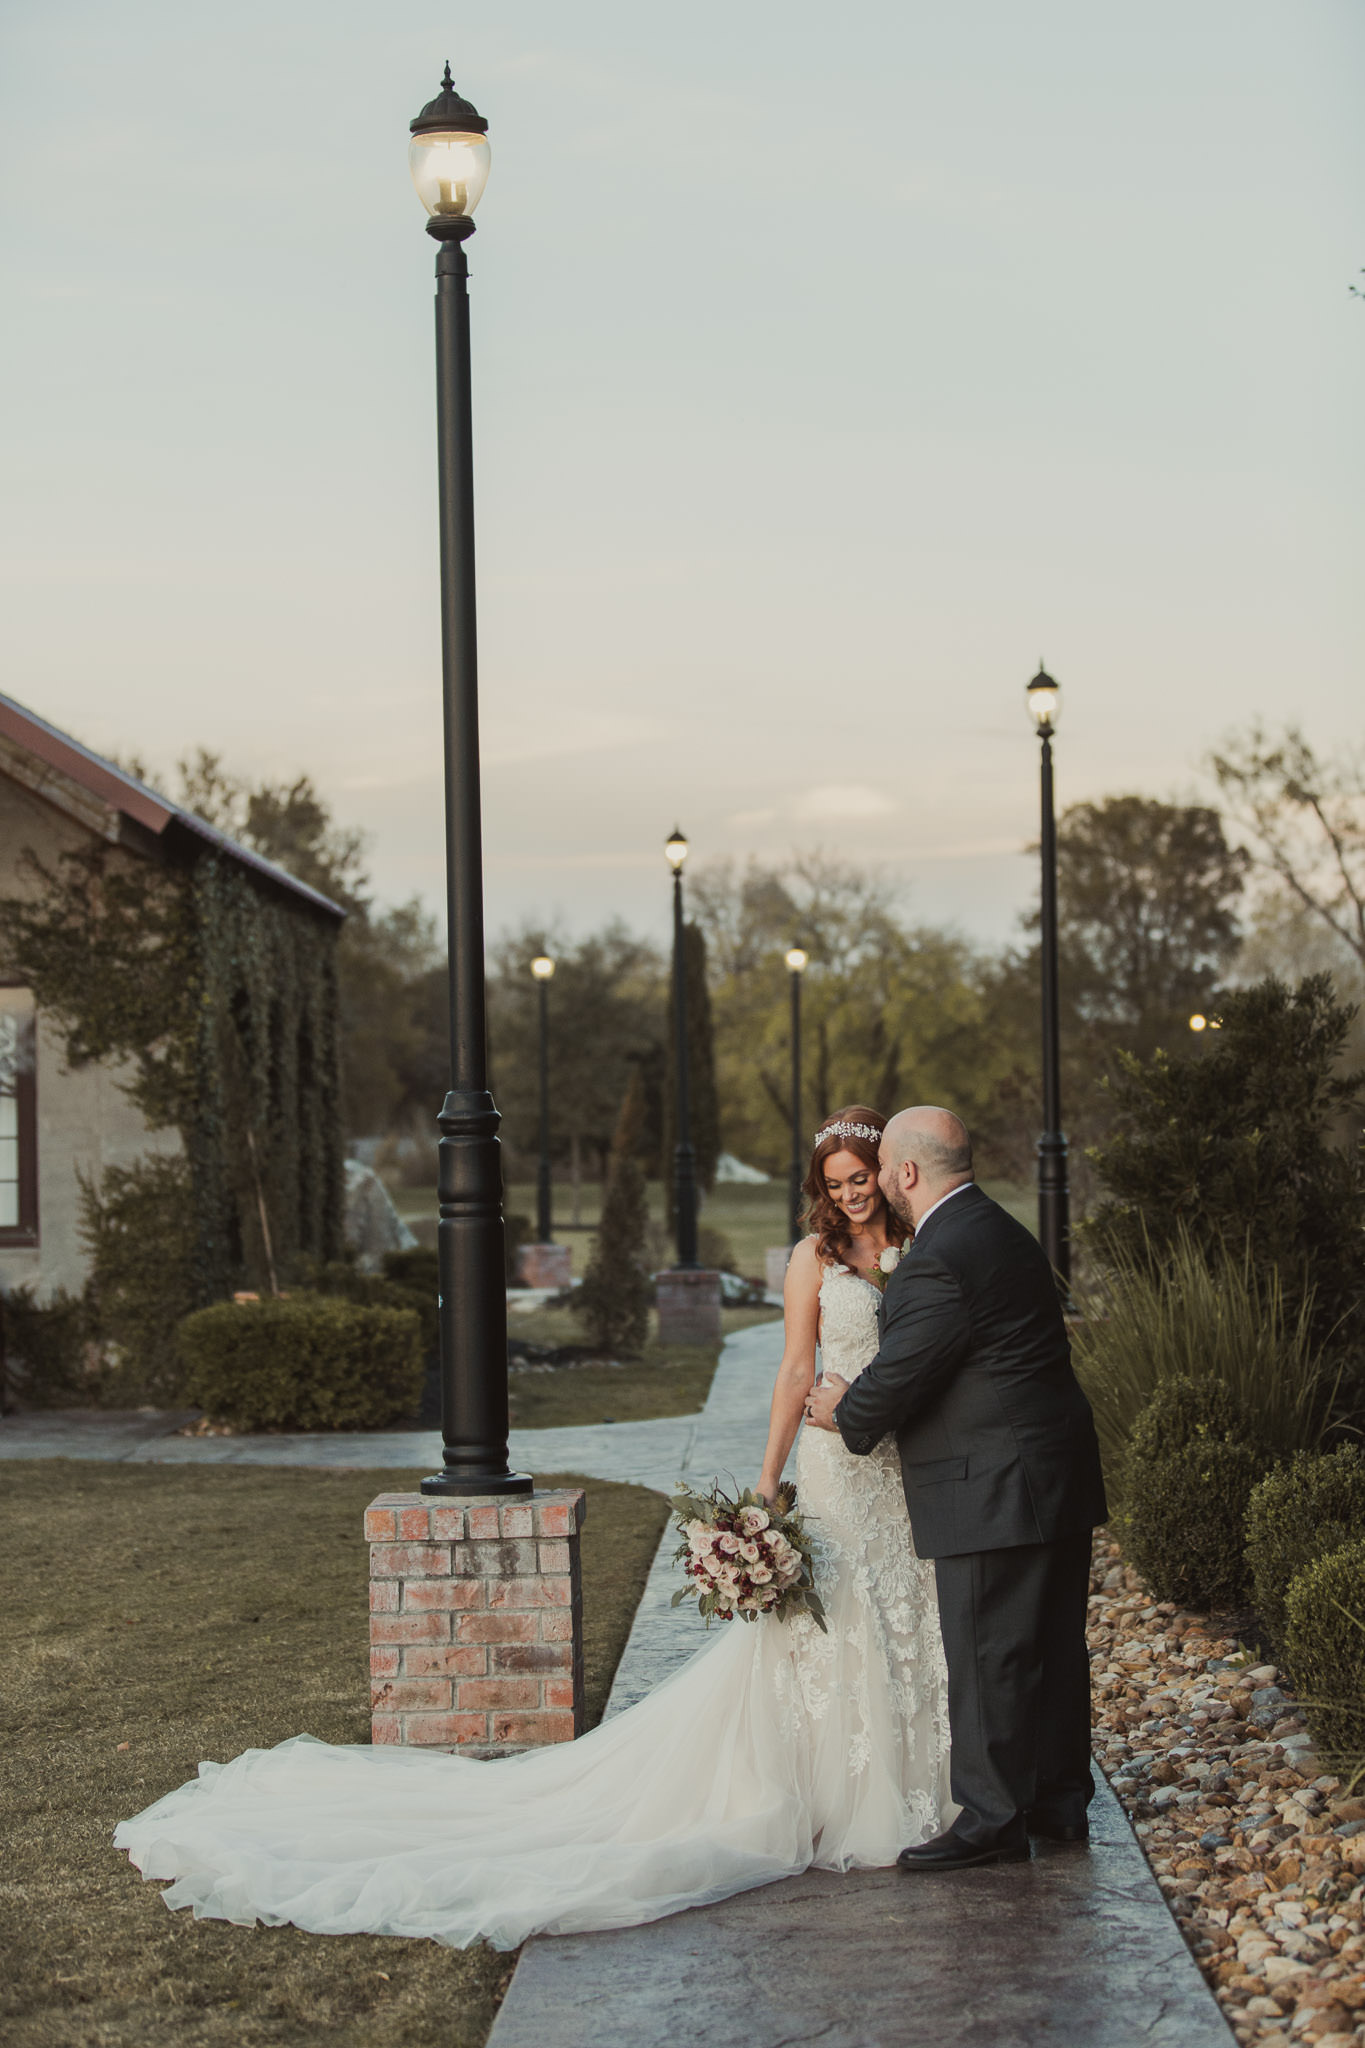 Cynthia-Curtis-Olde-Dobbine-Station-Houston-Wedding-Photographer-sm-74.jpg